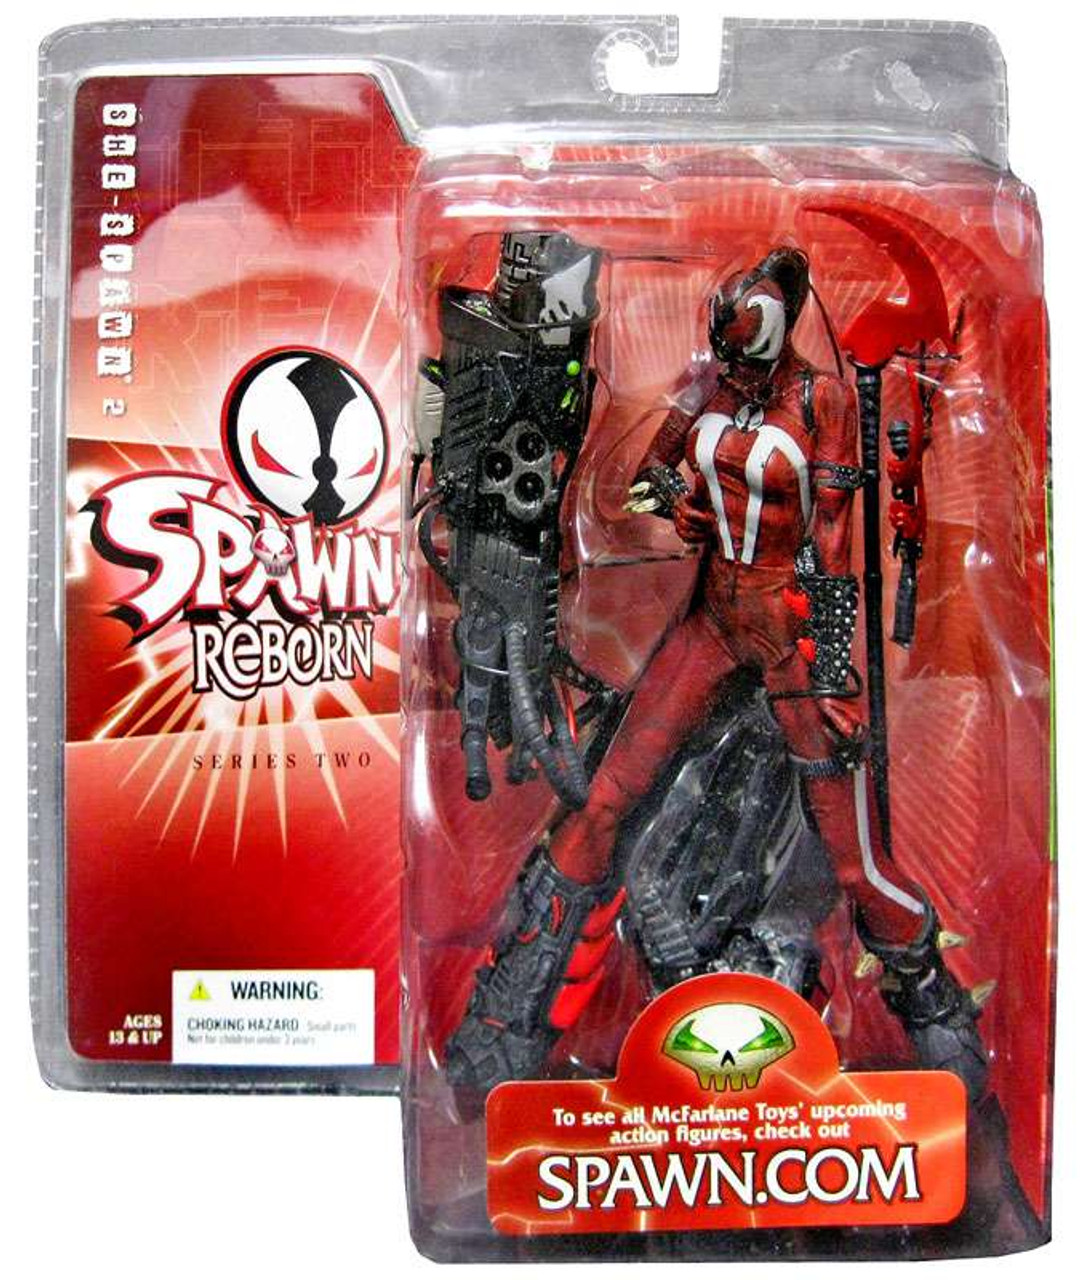 McFarlane Toys Spawn Reborn Series 2 She-Spawn 2 Action Figure